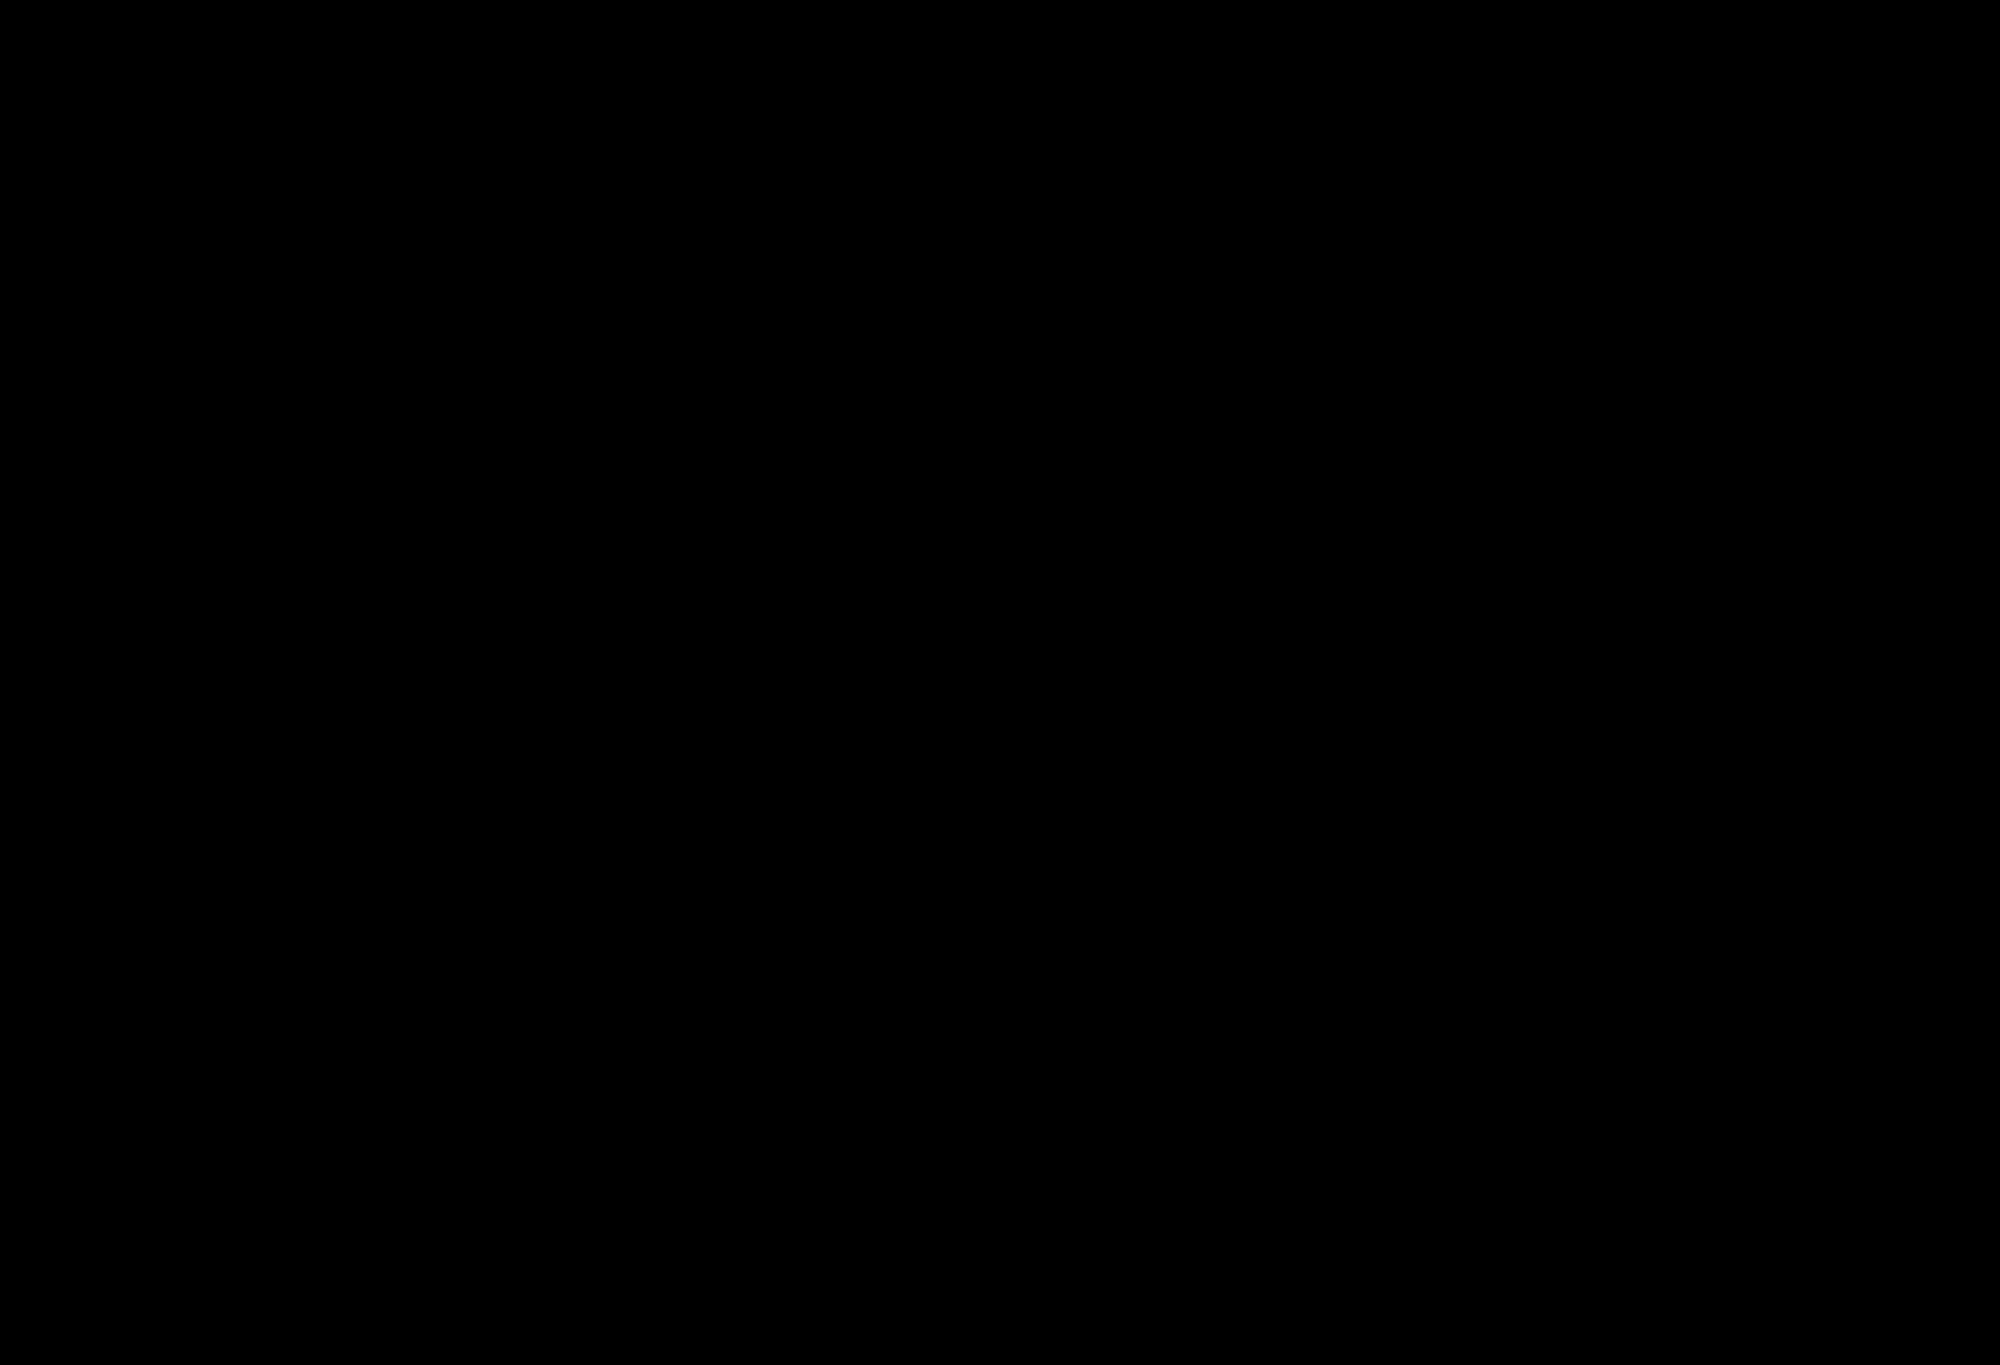 vector royalty free stock Gun PNG Black And White Transparent Gun Black And White